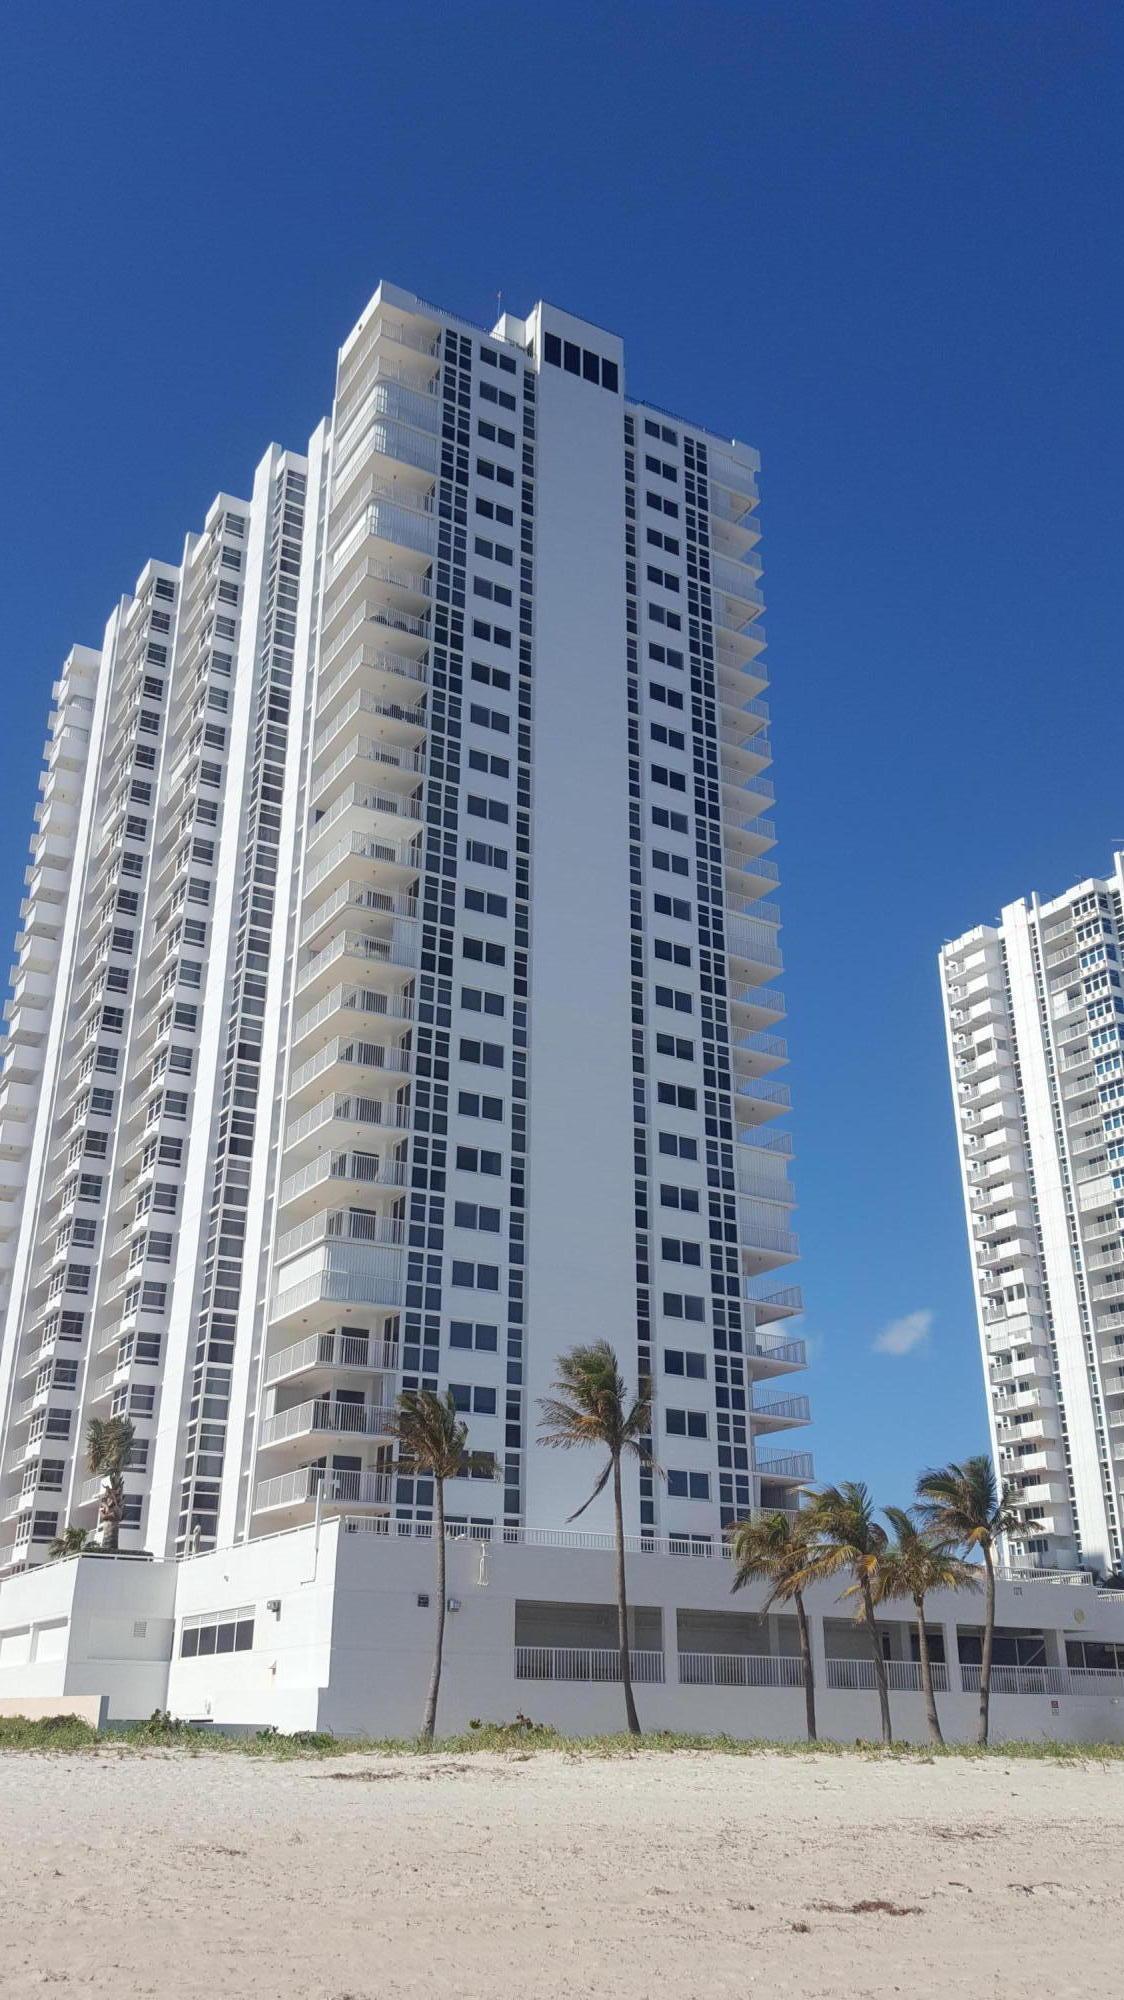 1370 S Ocean Boulevard, Pompano Beach, FL 33062